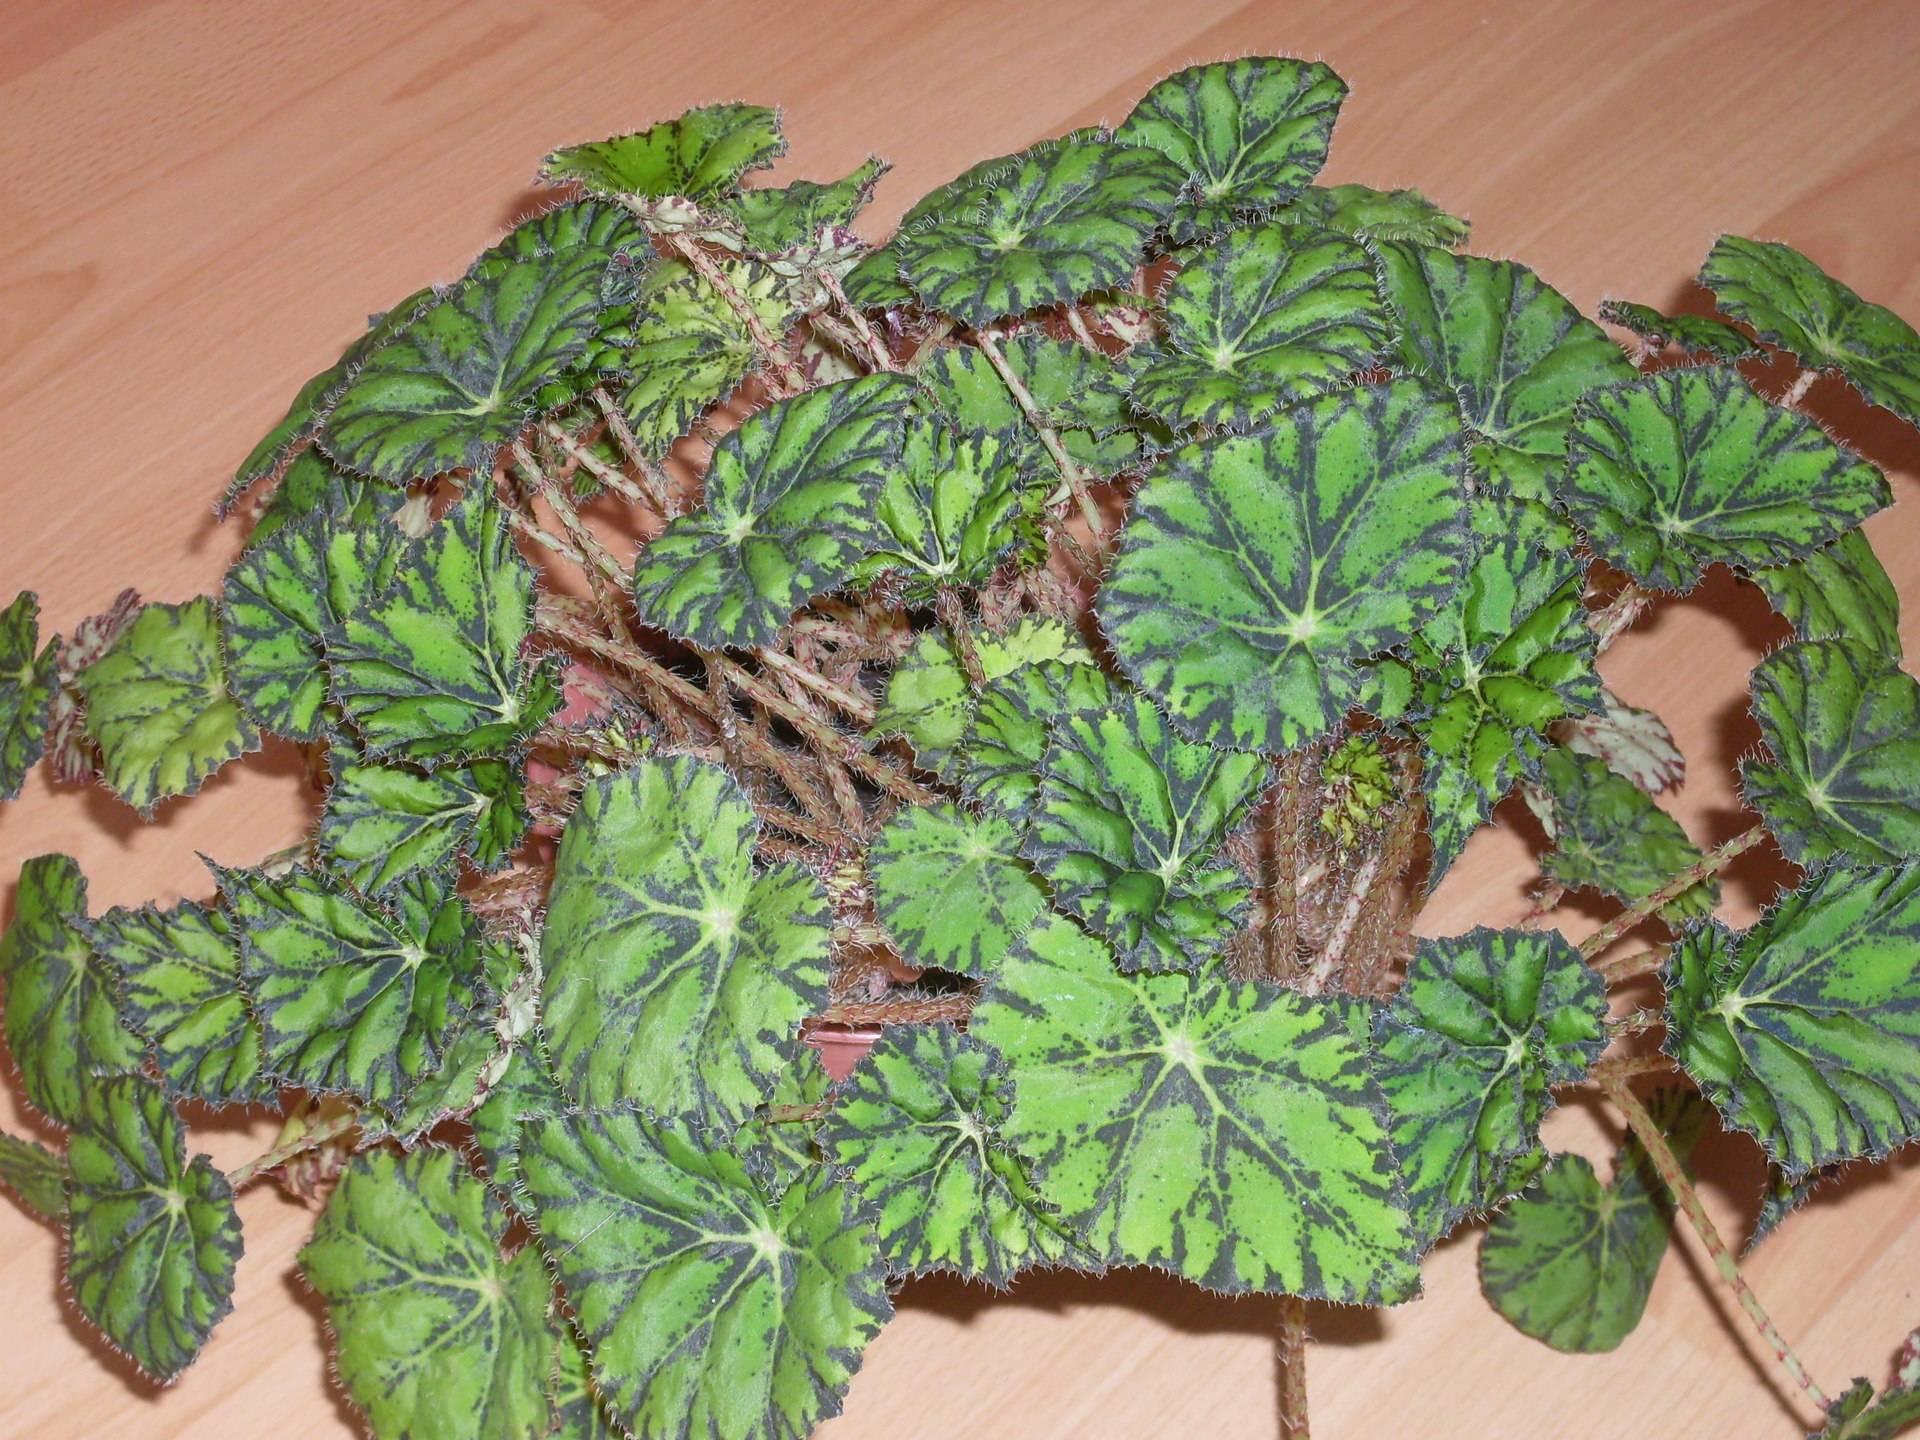 Декоративно-лиственная бегония: уход в домашних условиях с фото